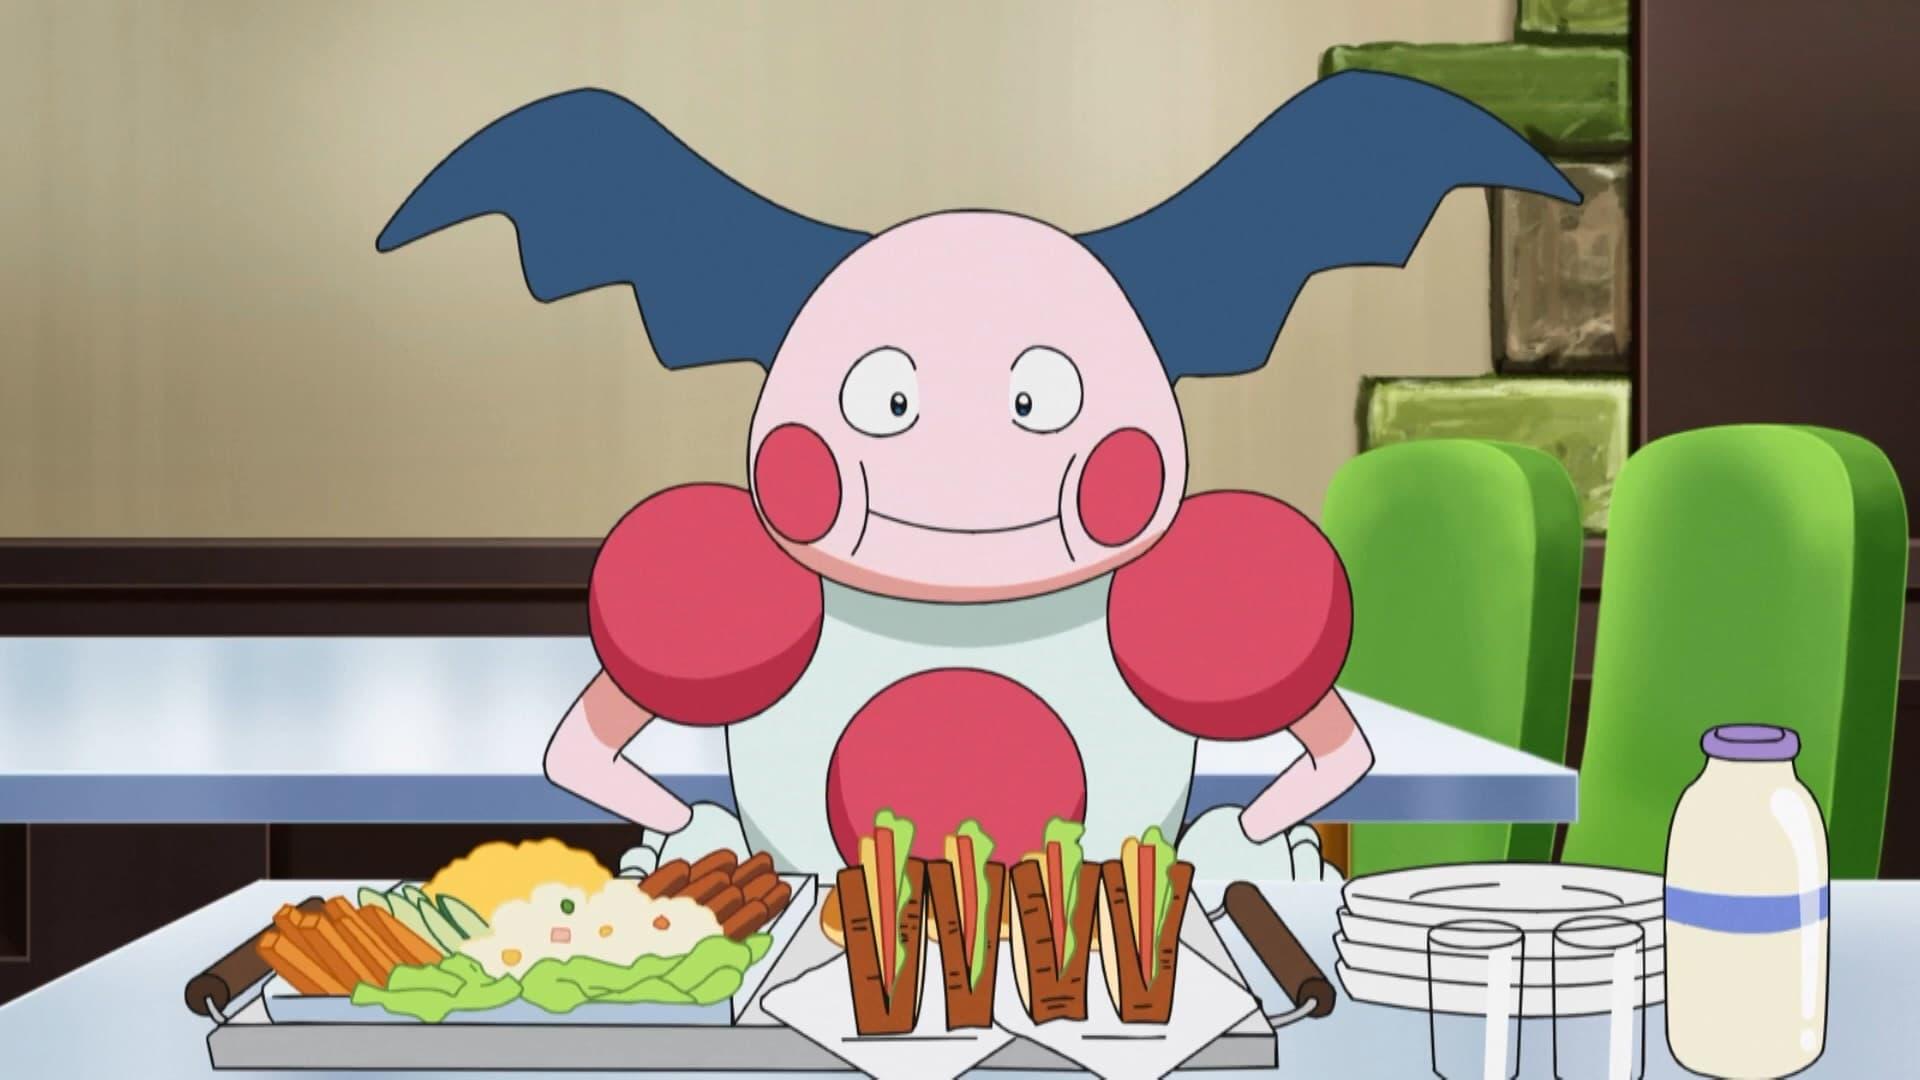 Pokémon - Season 23 Episode 4 : Let's Go to the Galar Region! An Encounter with Scorbunny!!